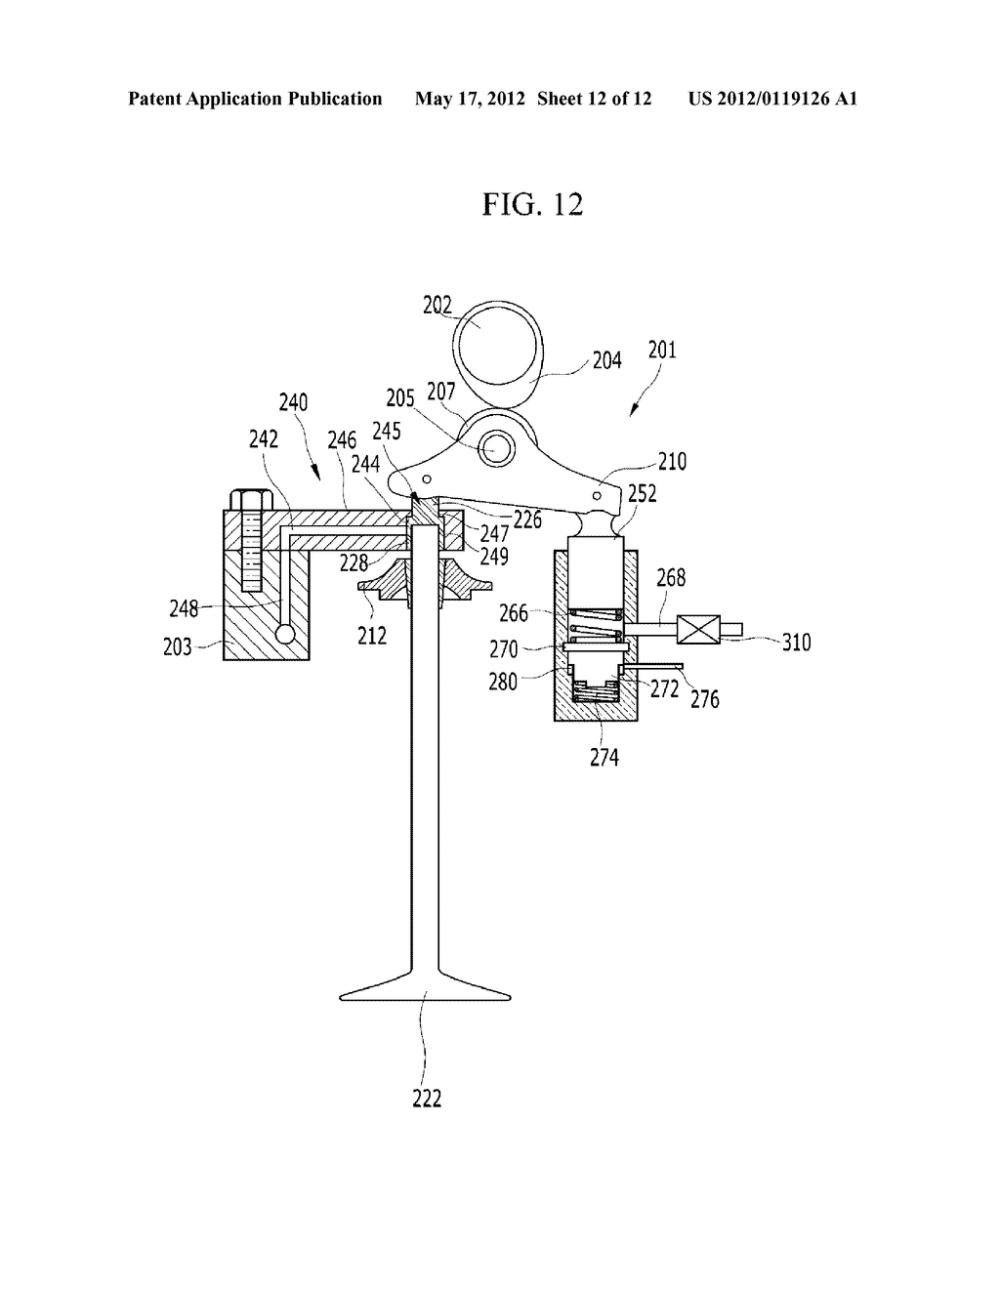 medium resolution of electro hydraulic valve train diagram schematic and image 13 rh patentsencyclopedia com overhead valve engine diagram